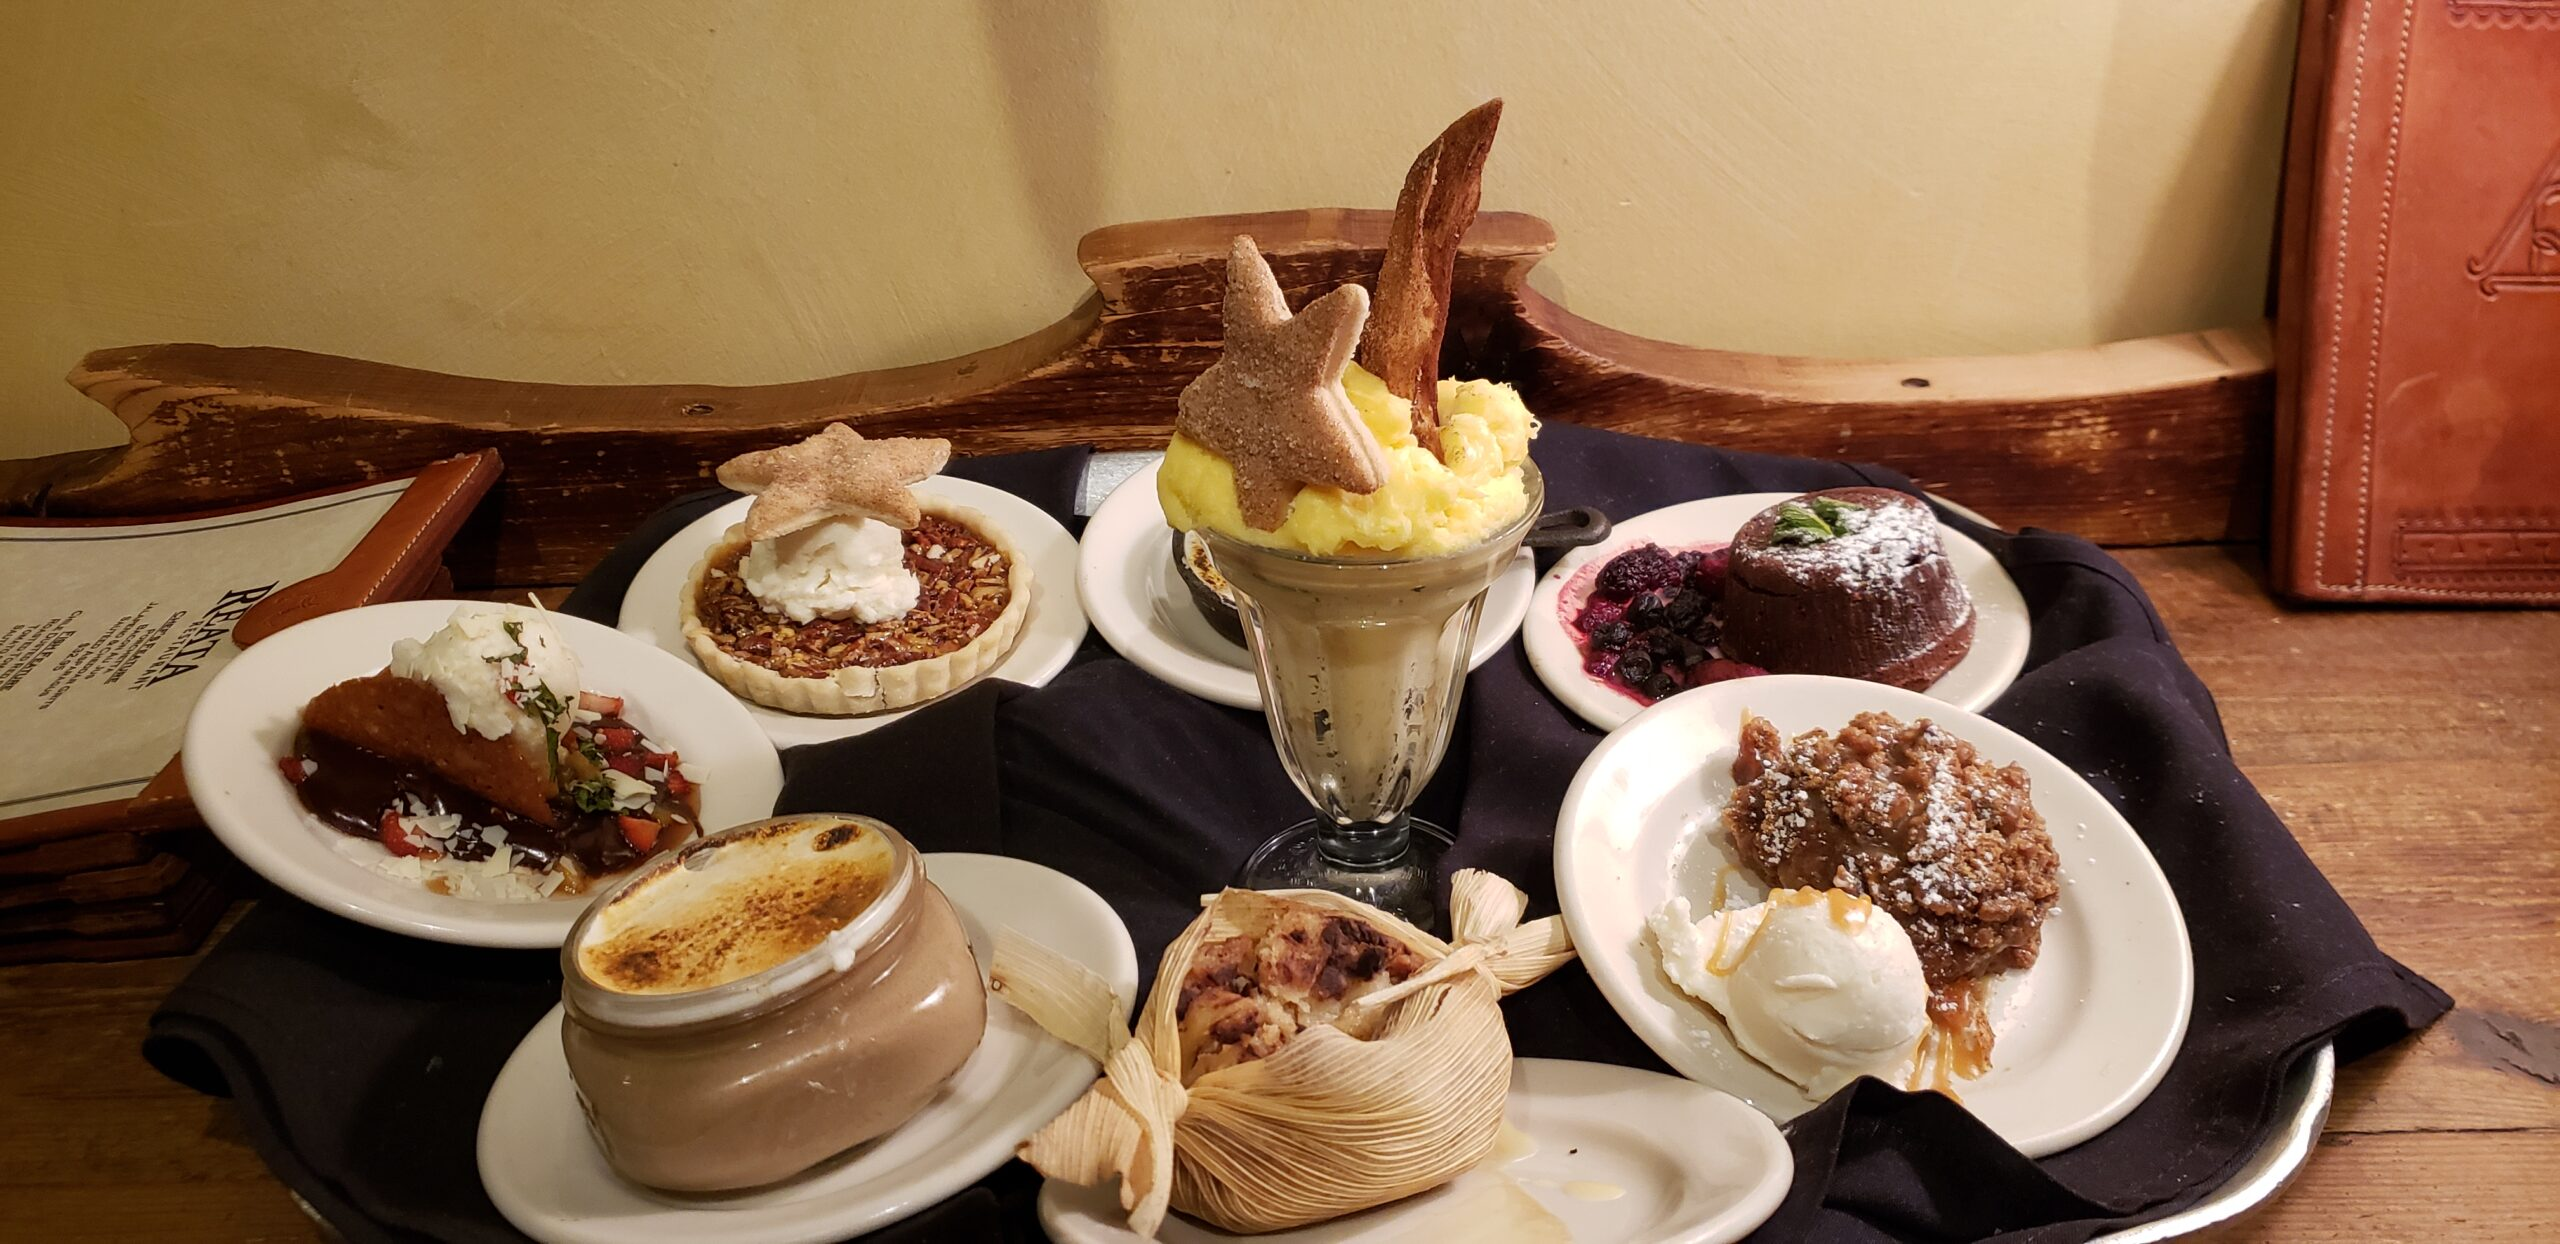 Riata desserts